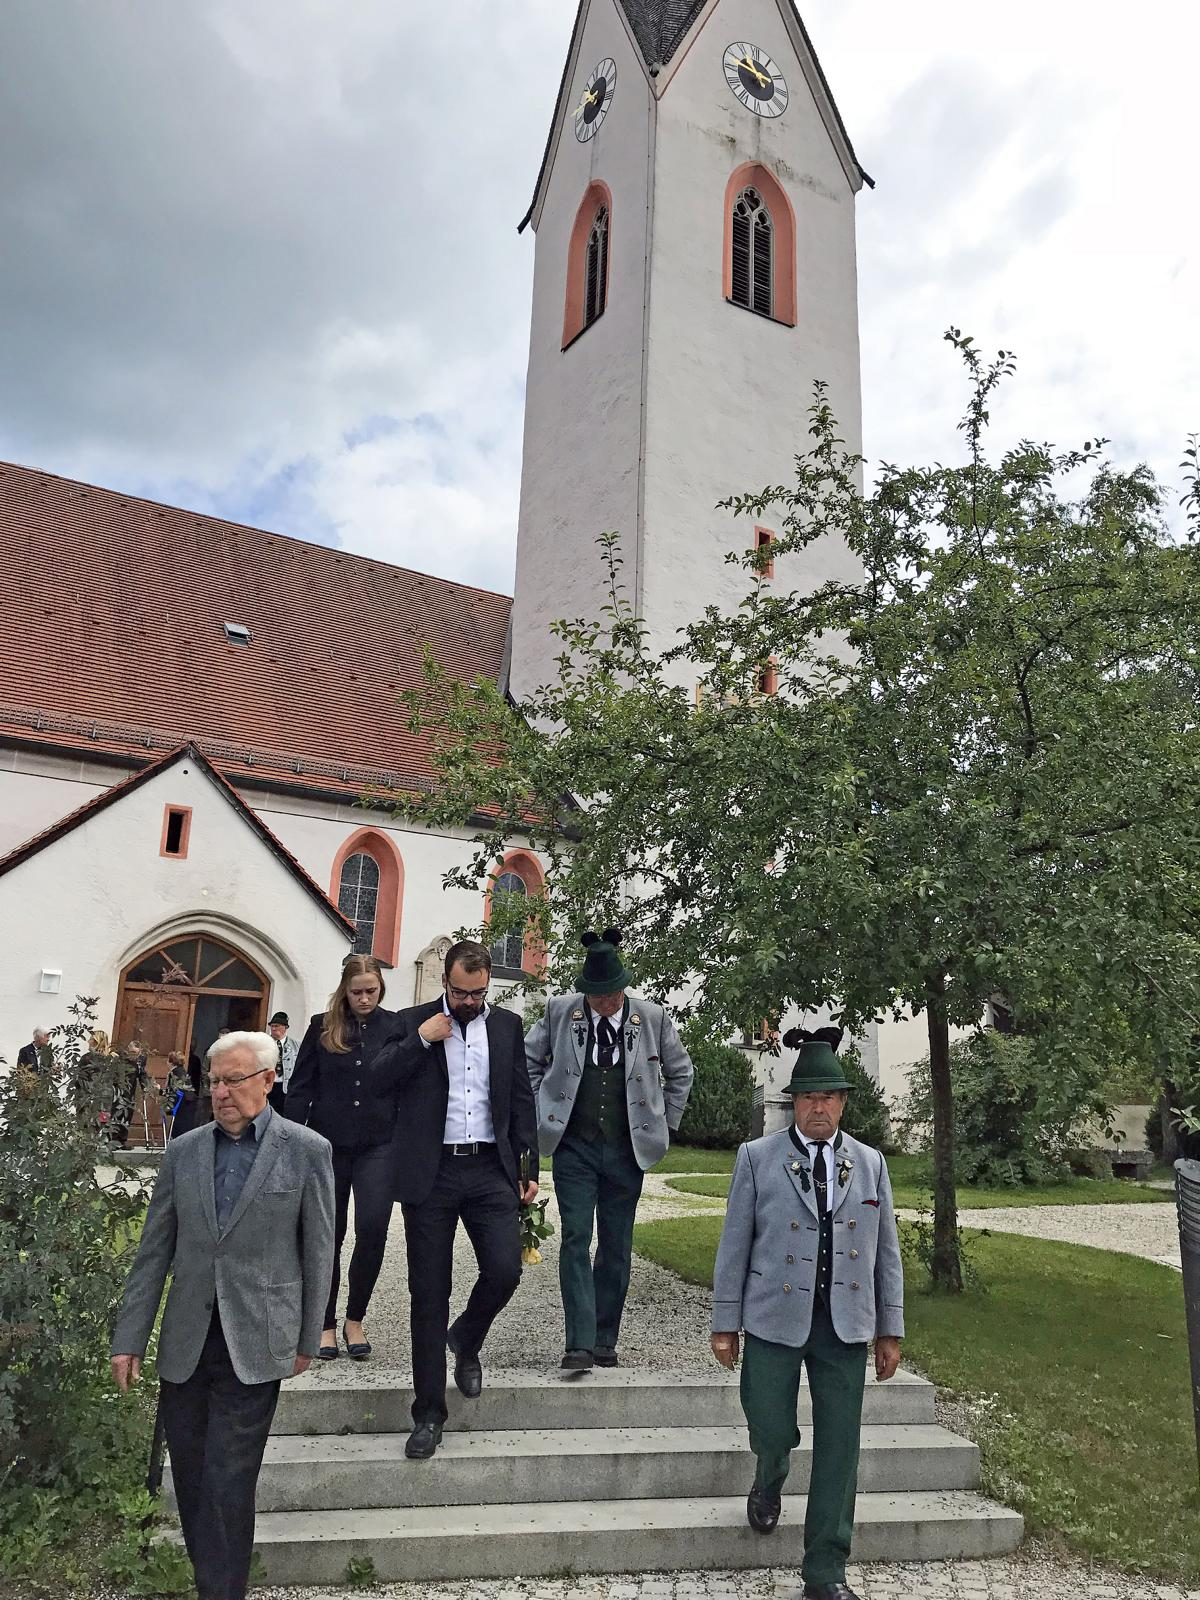 Beerdigung Ehrenvorstand Rupert Sonnenhuber, Amerang (4)